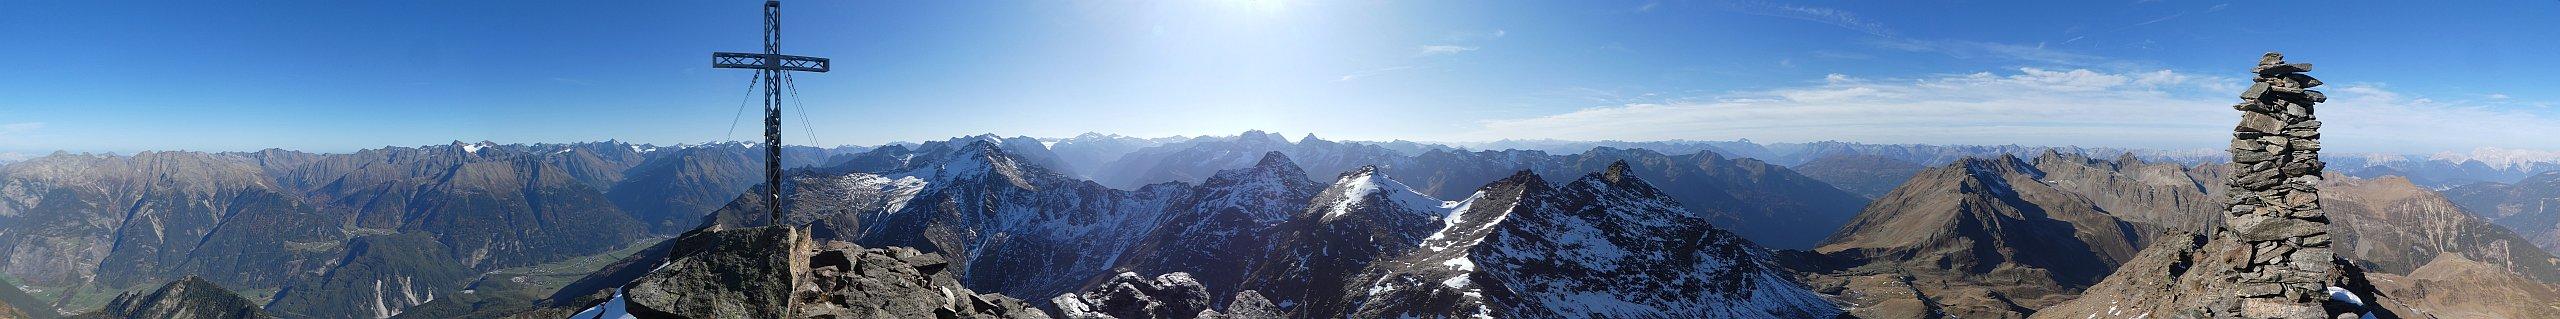 Panorama vom Gipfel des Fundusfeilers